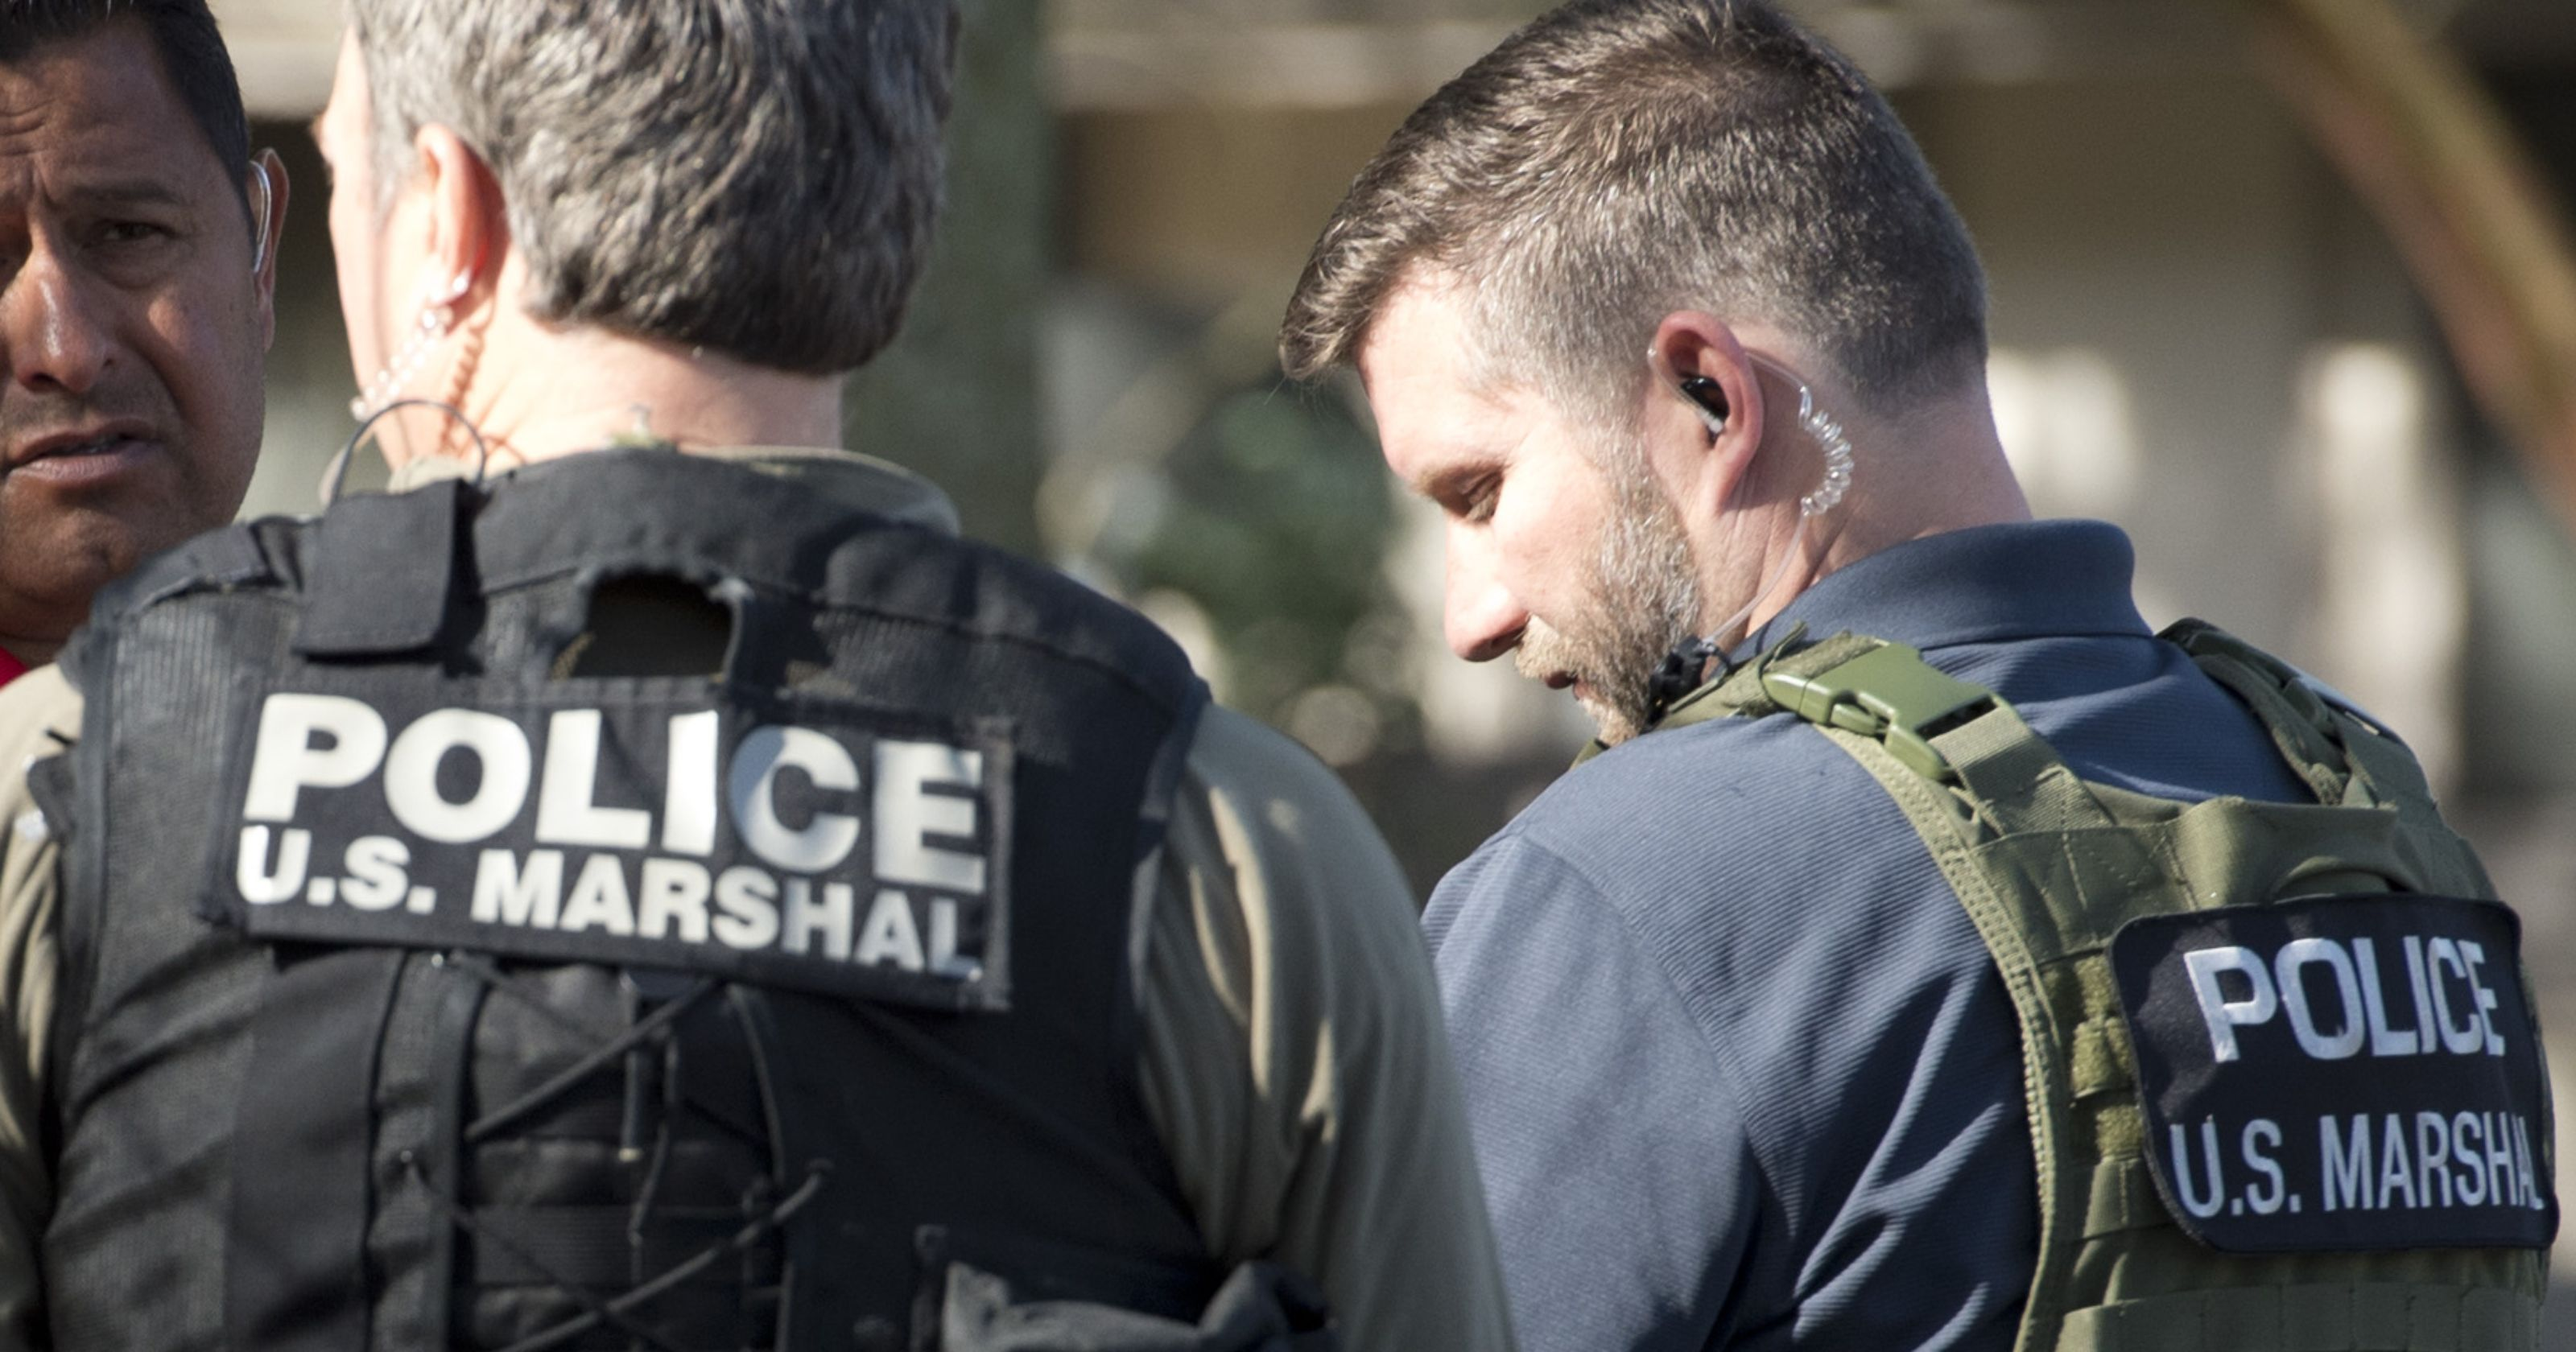 U.S. Marshals secretly tracked 6,000 cellphones Us